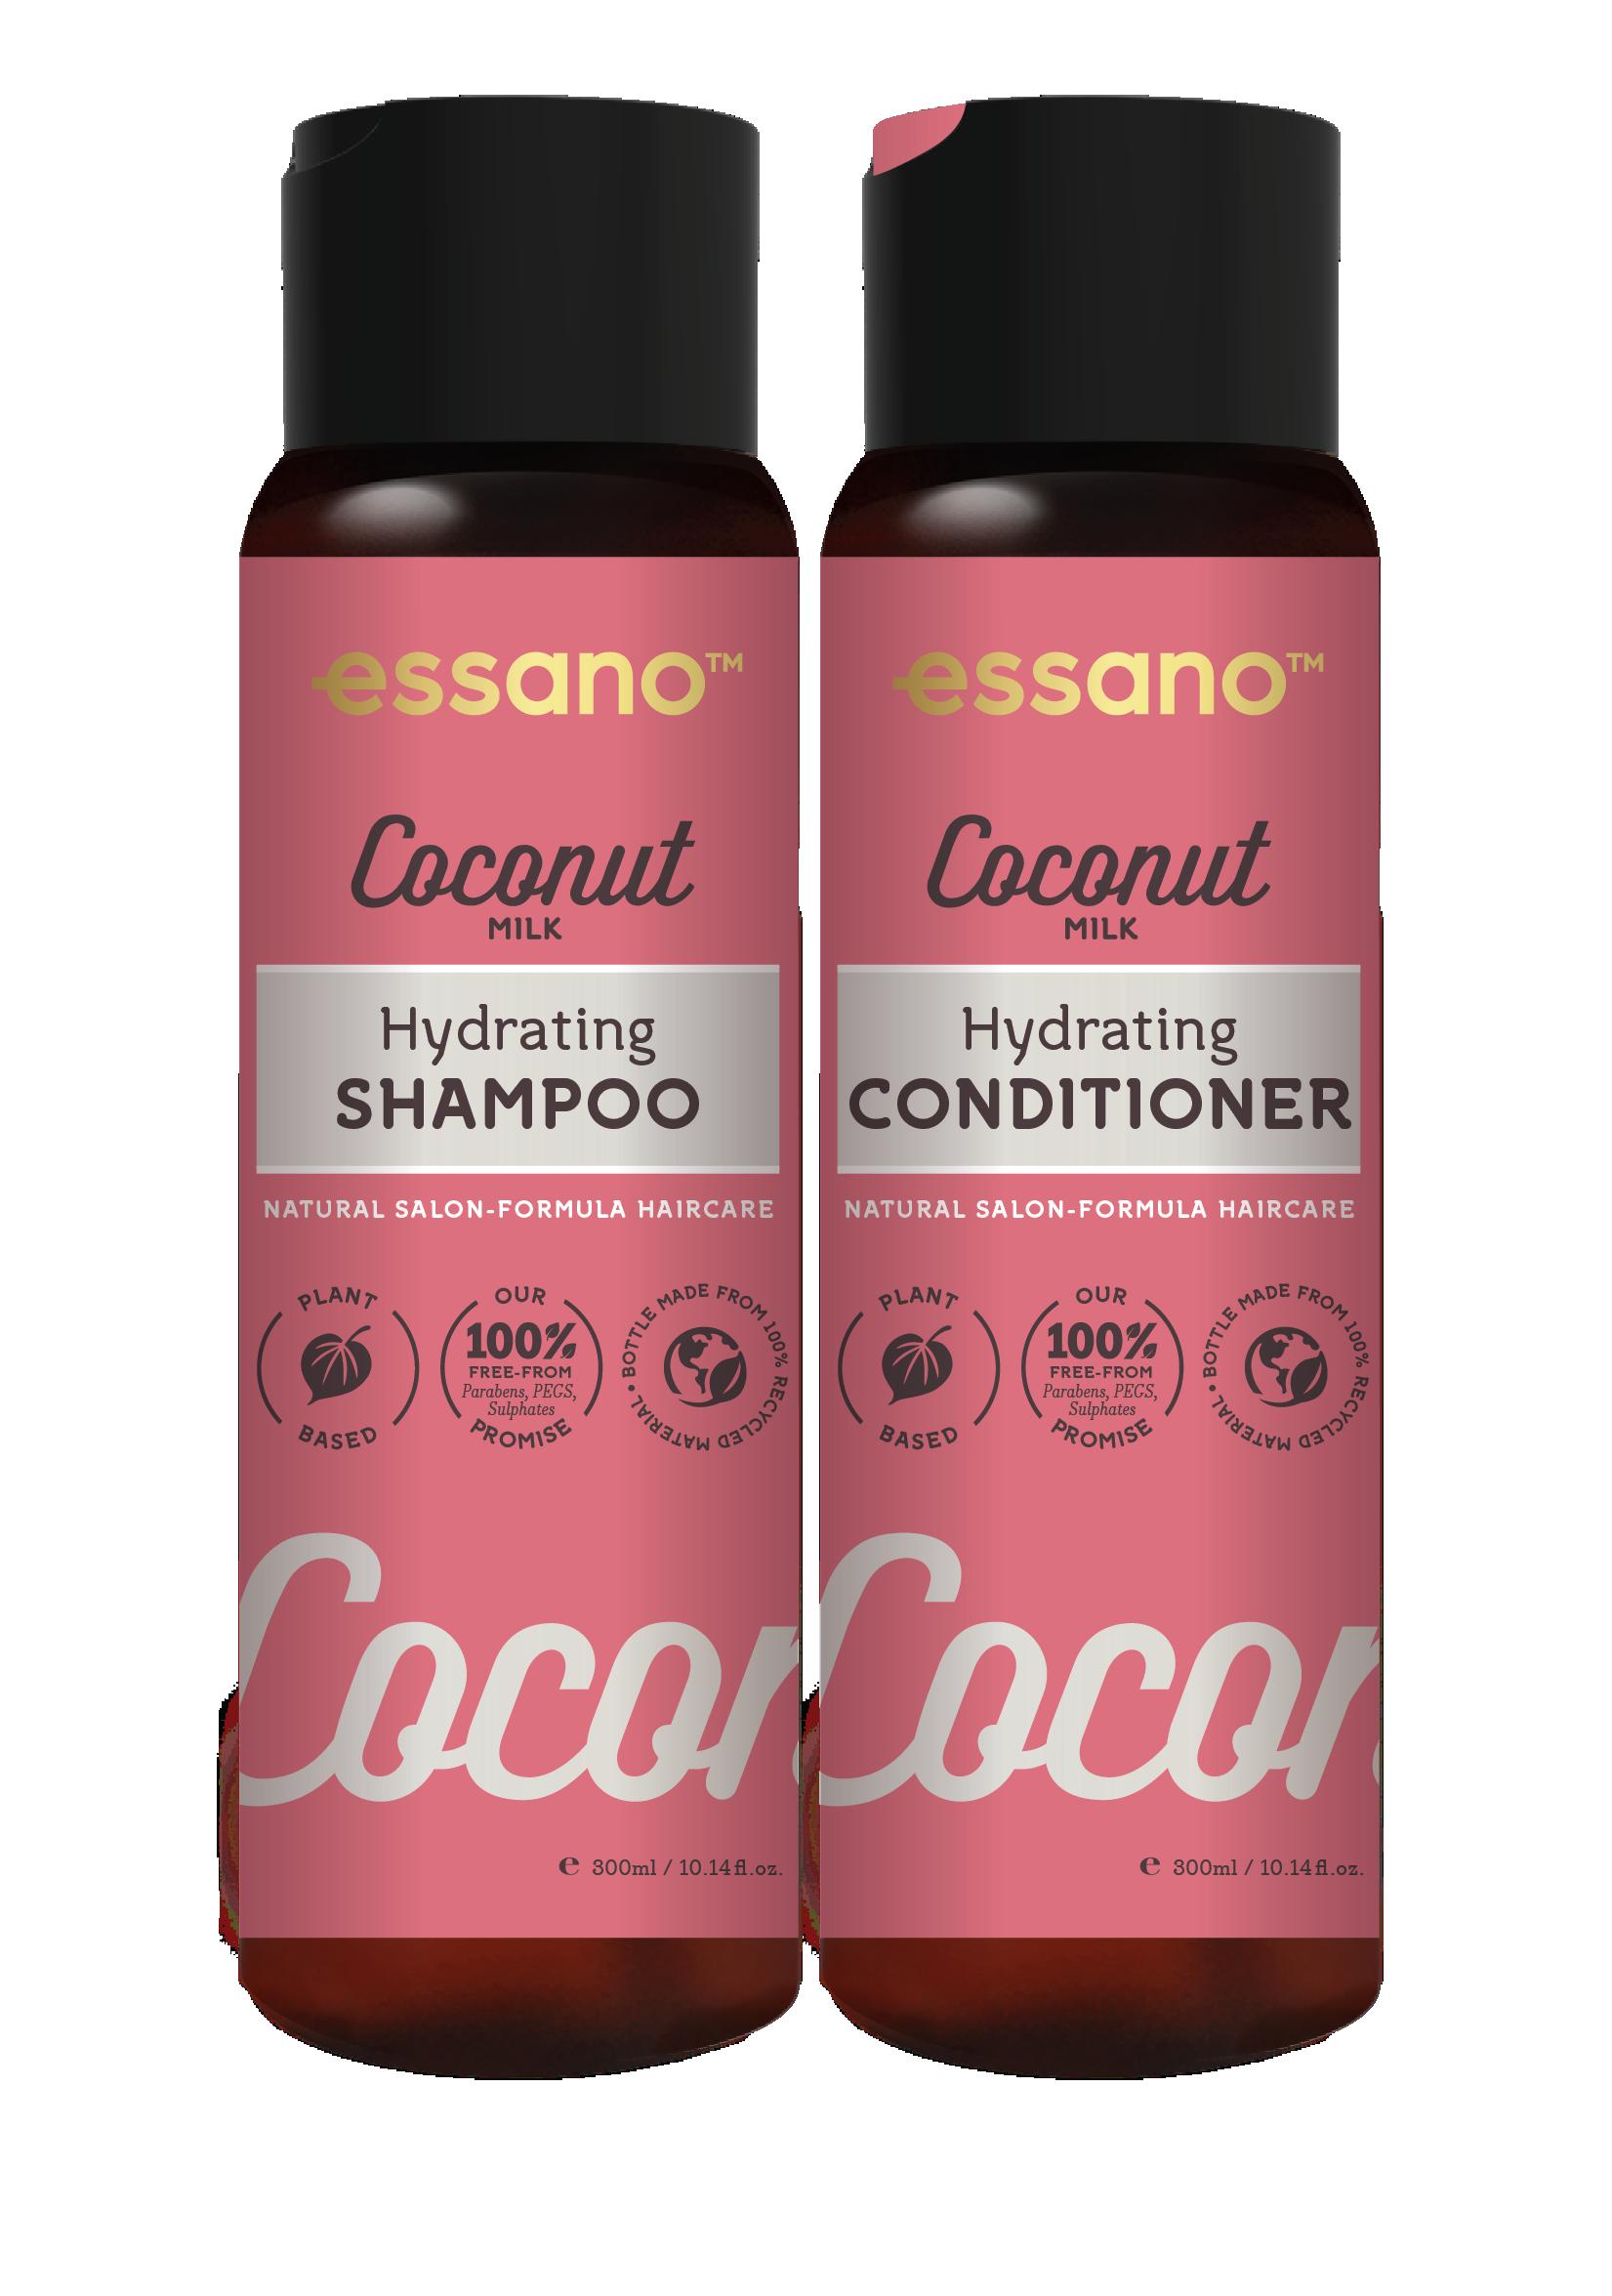 Essano Coconut Hydrating Shampoo and Conditioner duo